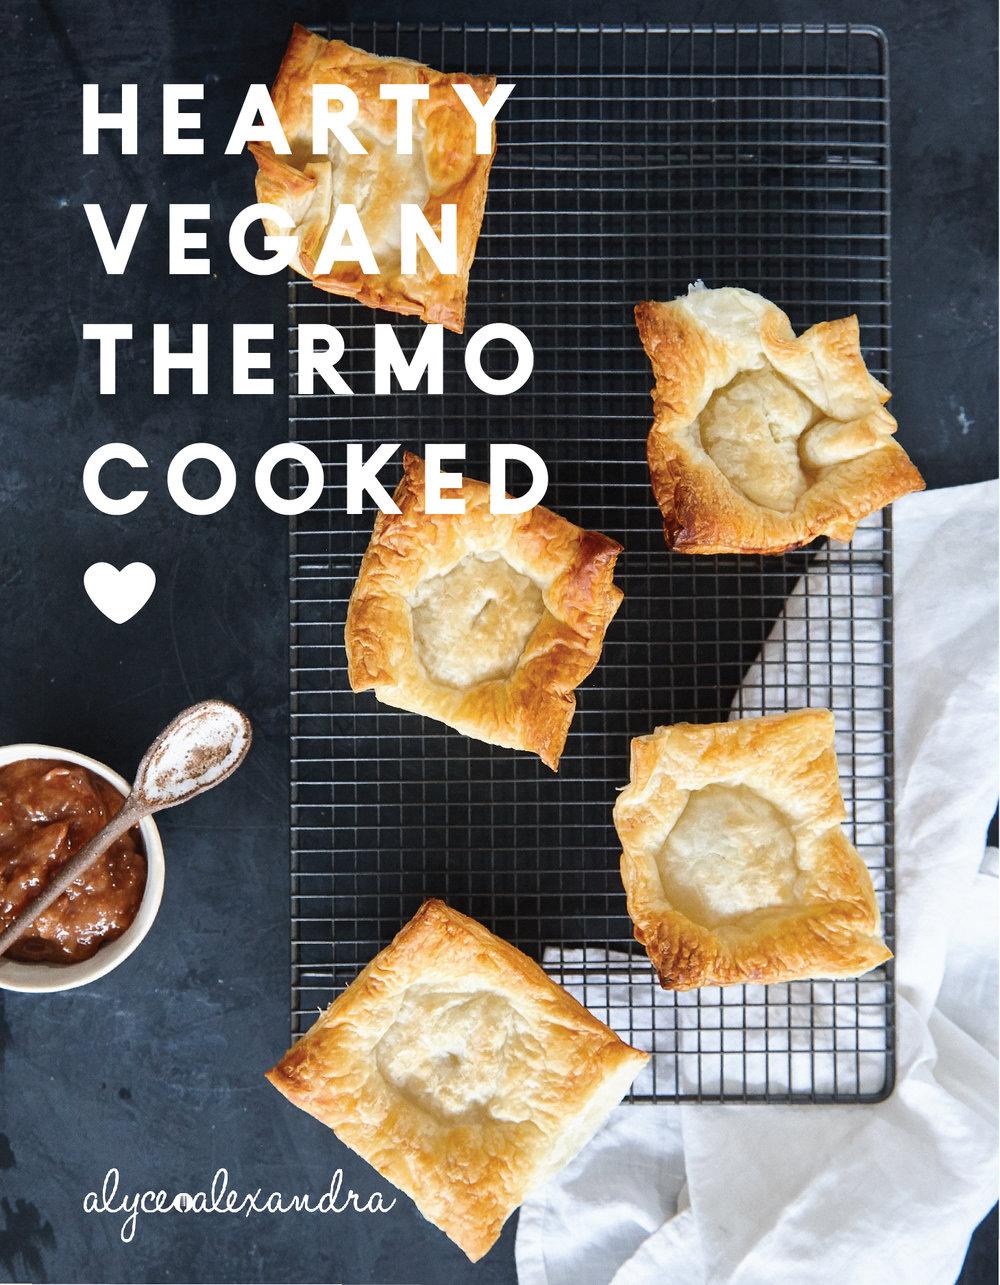 vegan ebook cover.jpg